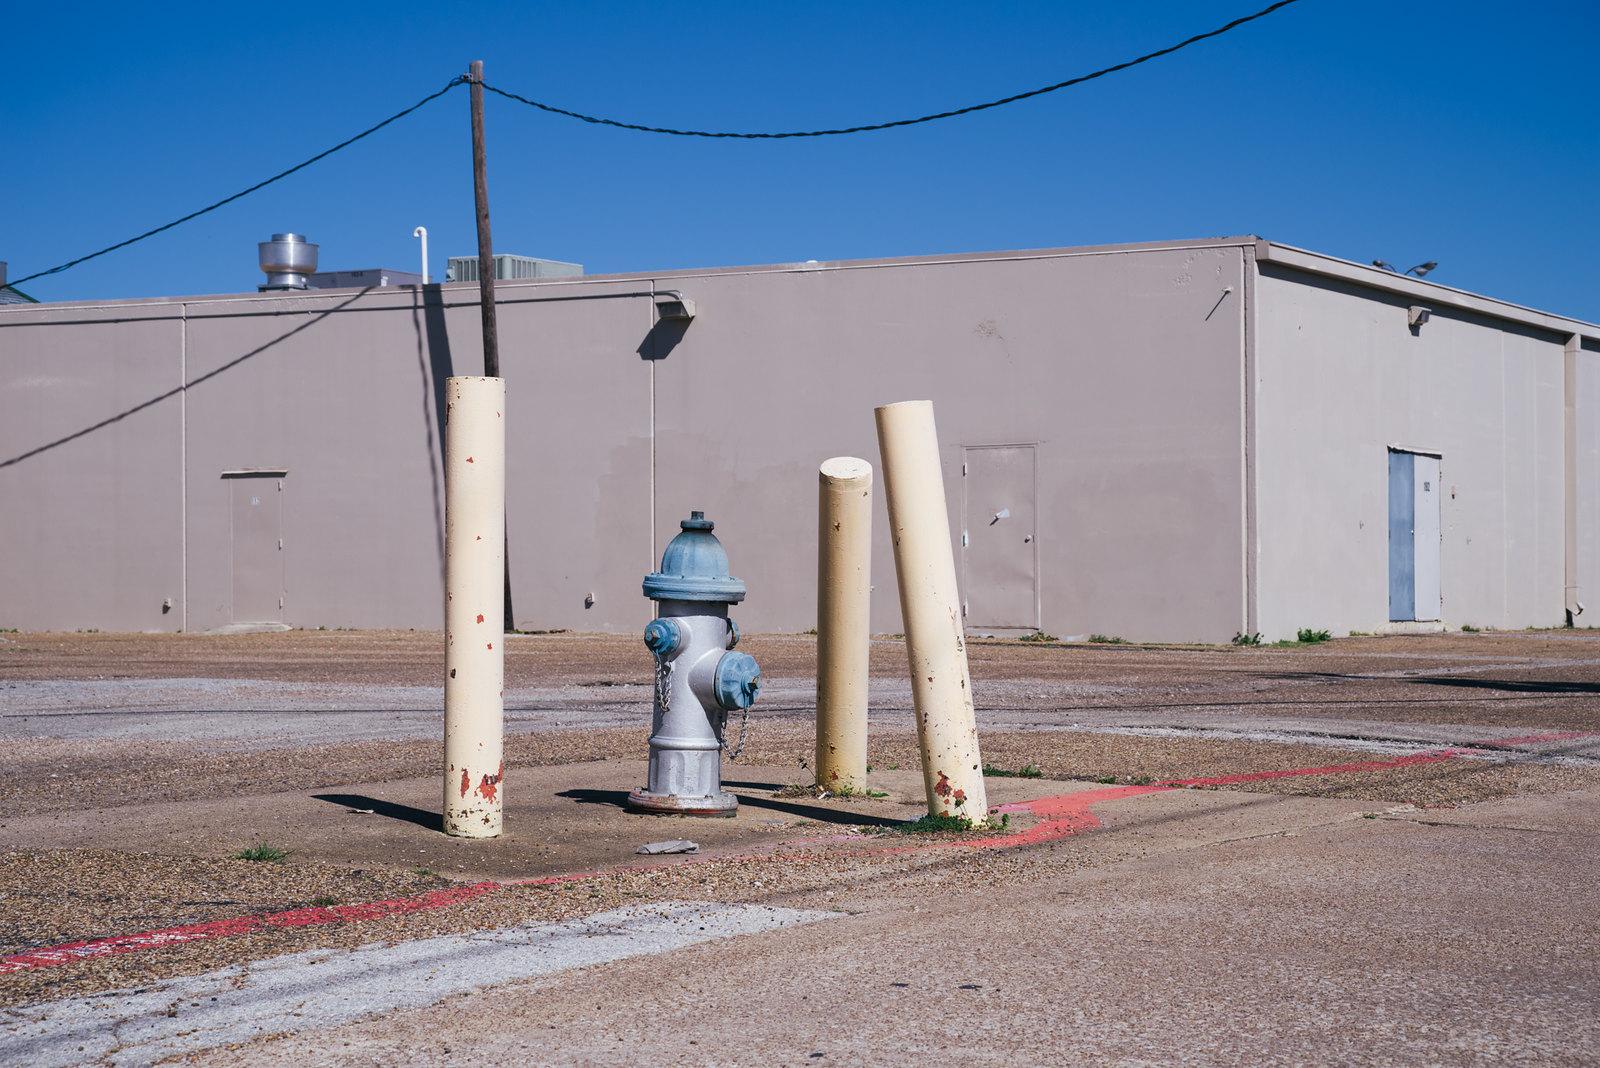 Lewisville, TX | by BurlapZack